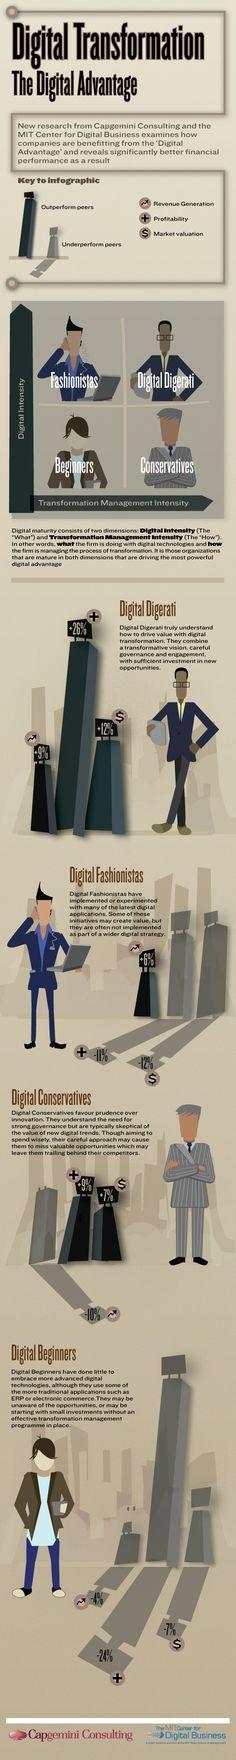 La ventaja de ser digital #infografia #infographic #internet